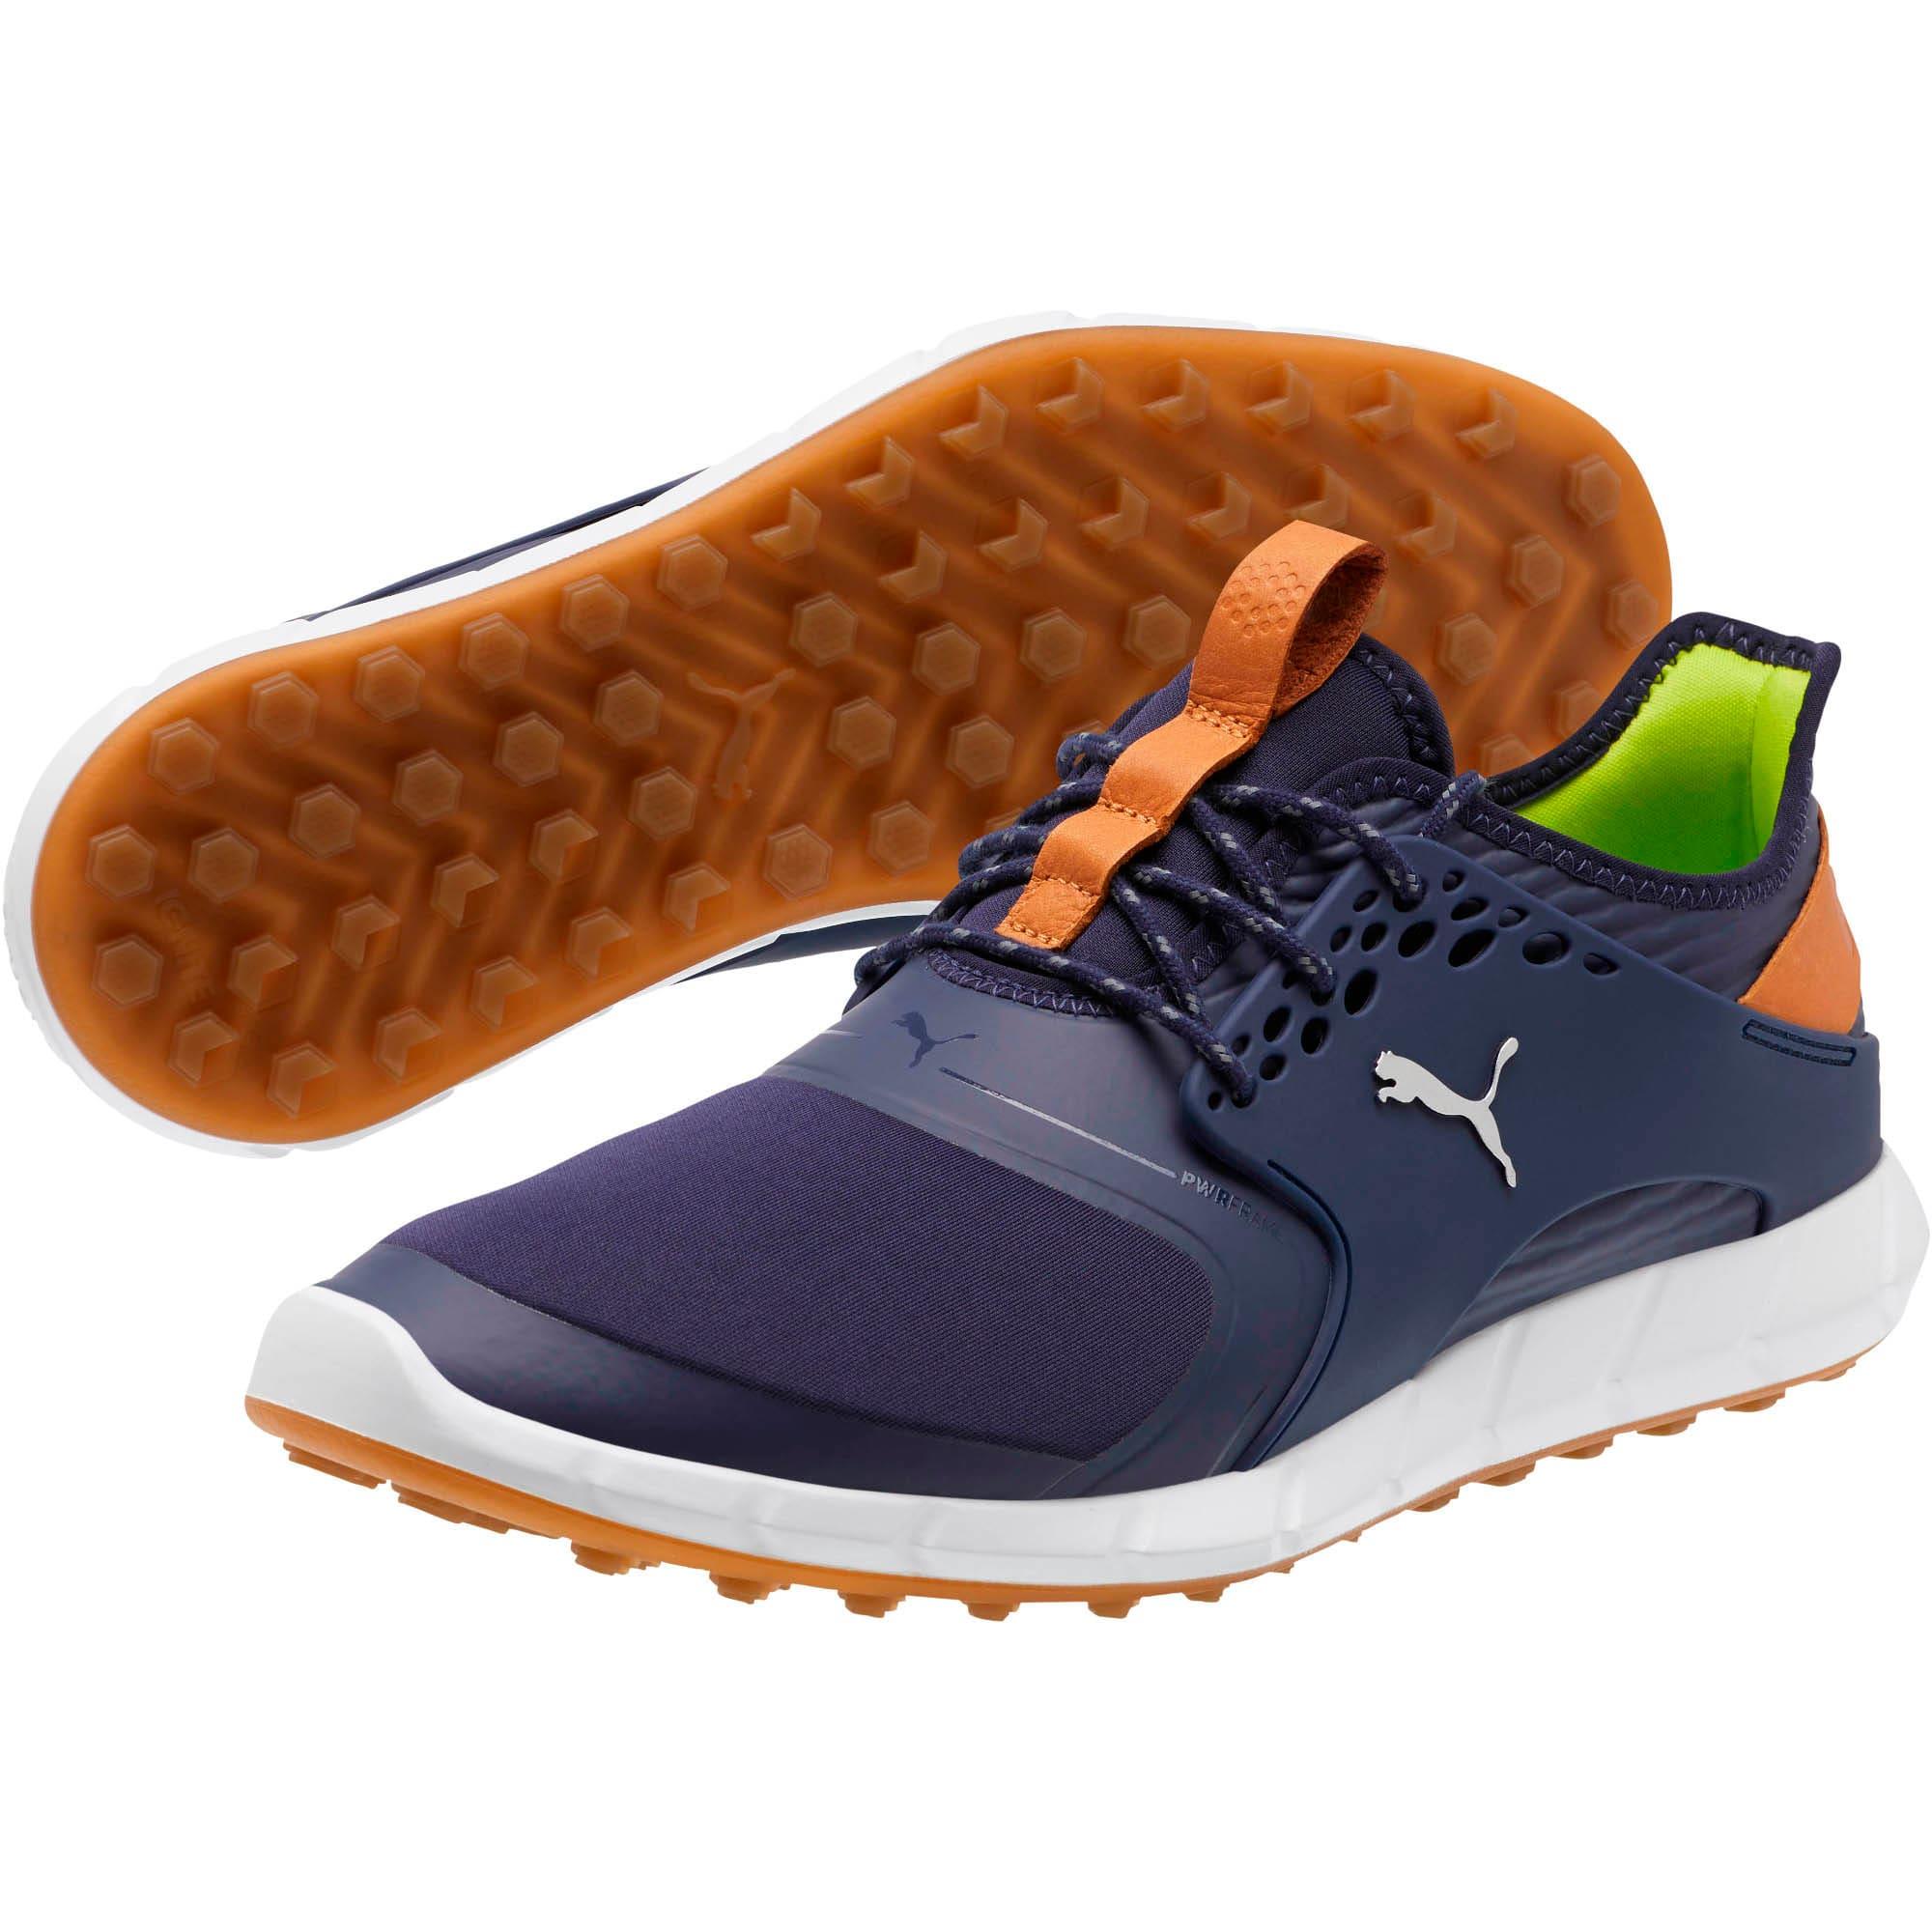 Thumbnail 2 of IGNITE PWRSPORT Men's Golf Shoes, Peacoat-Silver, medium